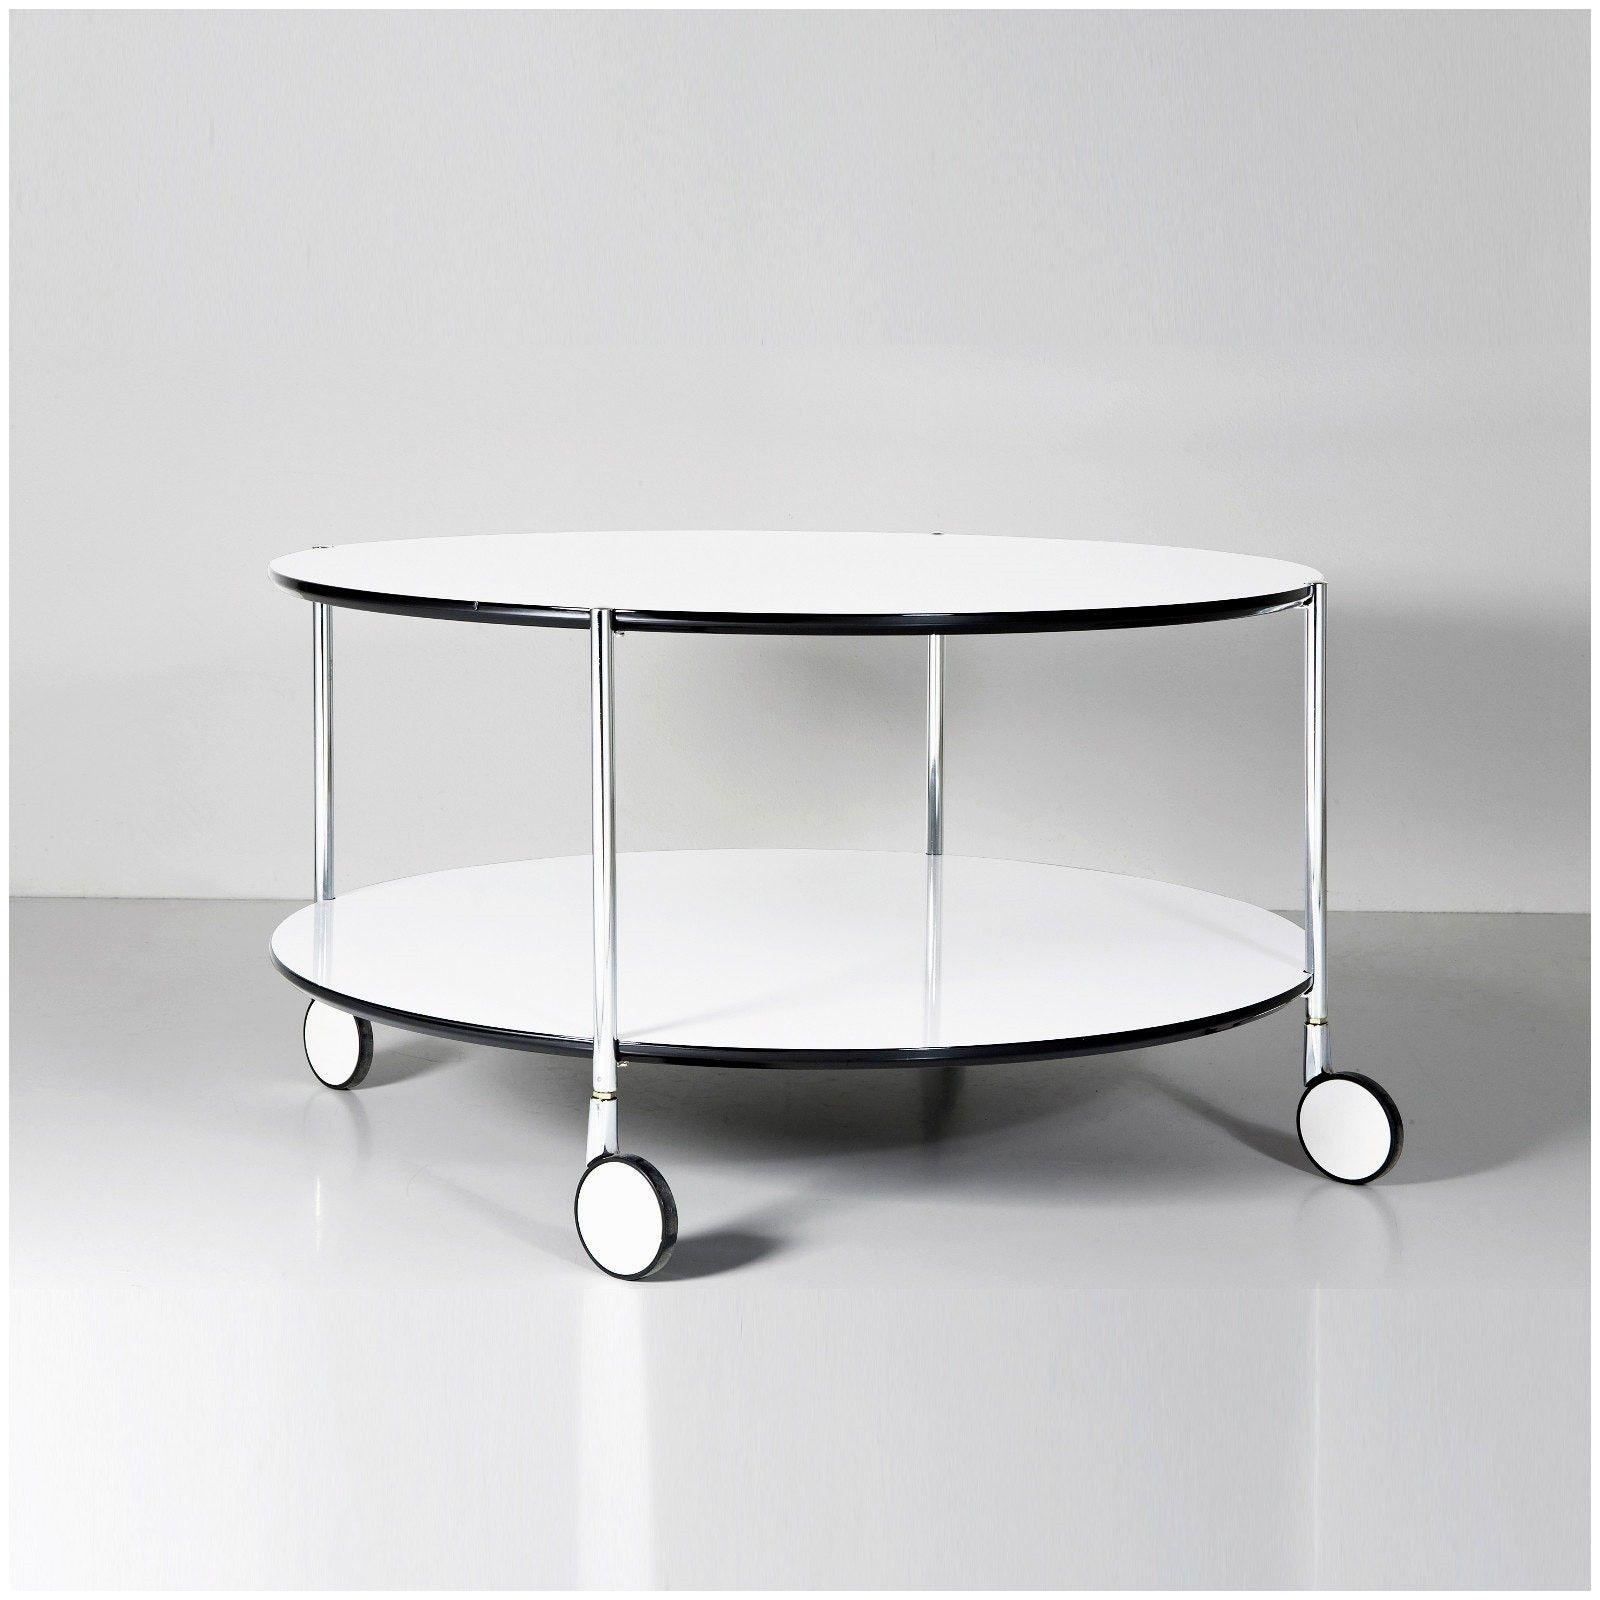 Ausgezeichnet Mobel Boss Ecksofa Home Decor Coffee Table Table